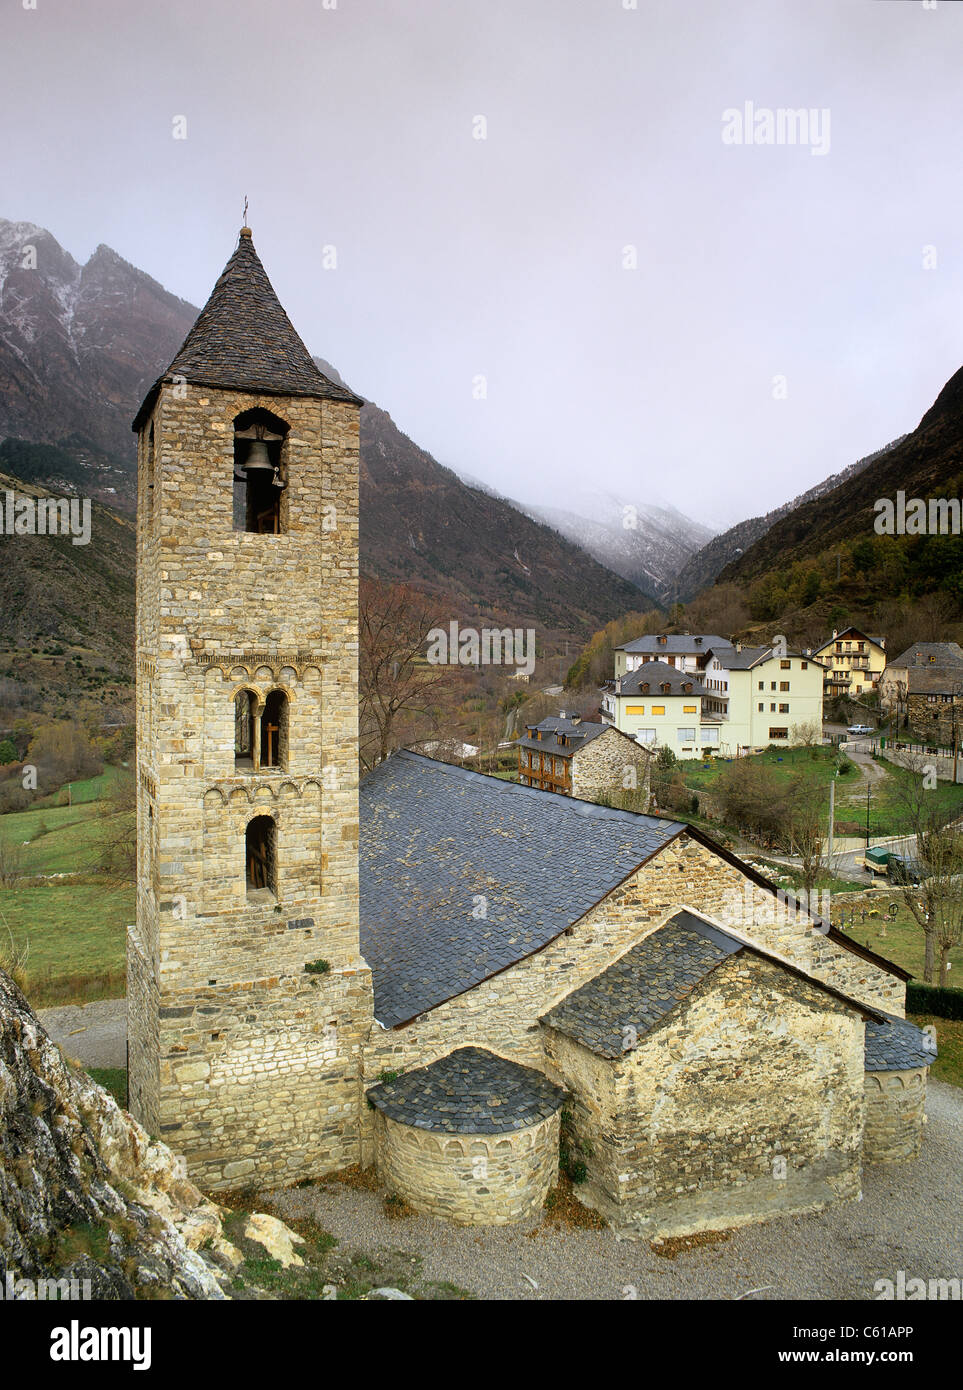 Sant Joan de Boi World Heritage romanesque church in Boi valley Catalonia Pyrenees Spain - Stock Image